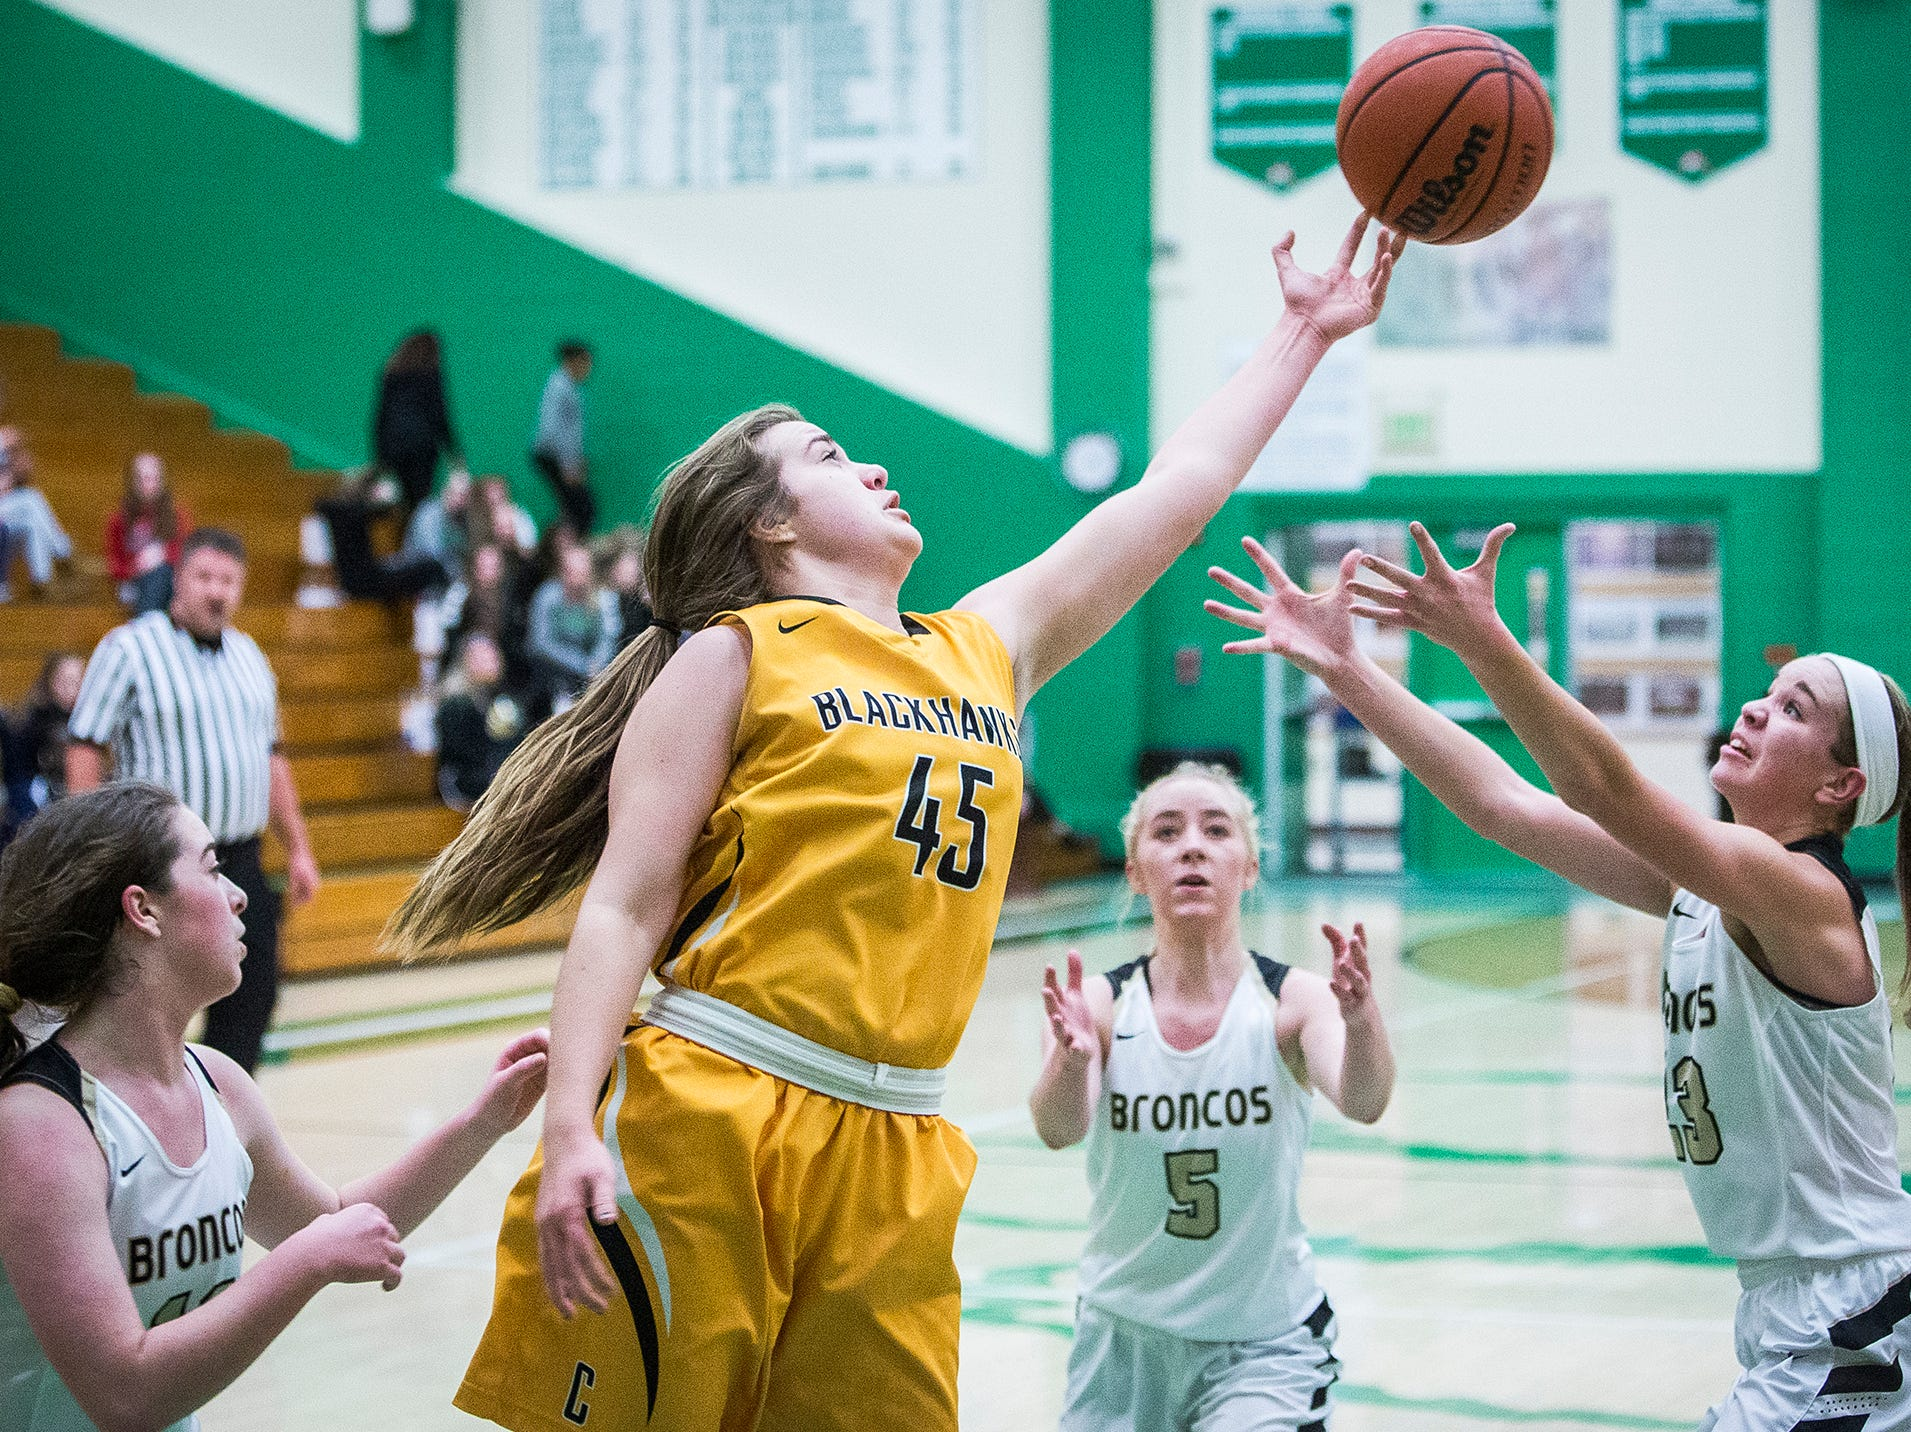 Cowan's Emma Johnson grabs a rebound past Daleville's defense during their game at Yorktown High School Tuesday, Jan. 8, 2019.